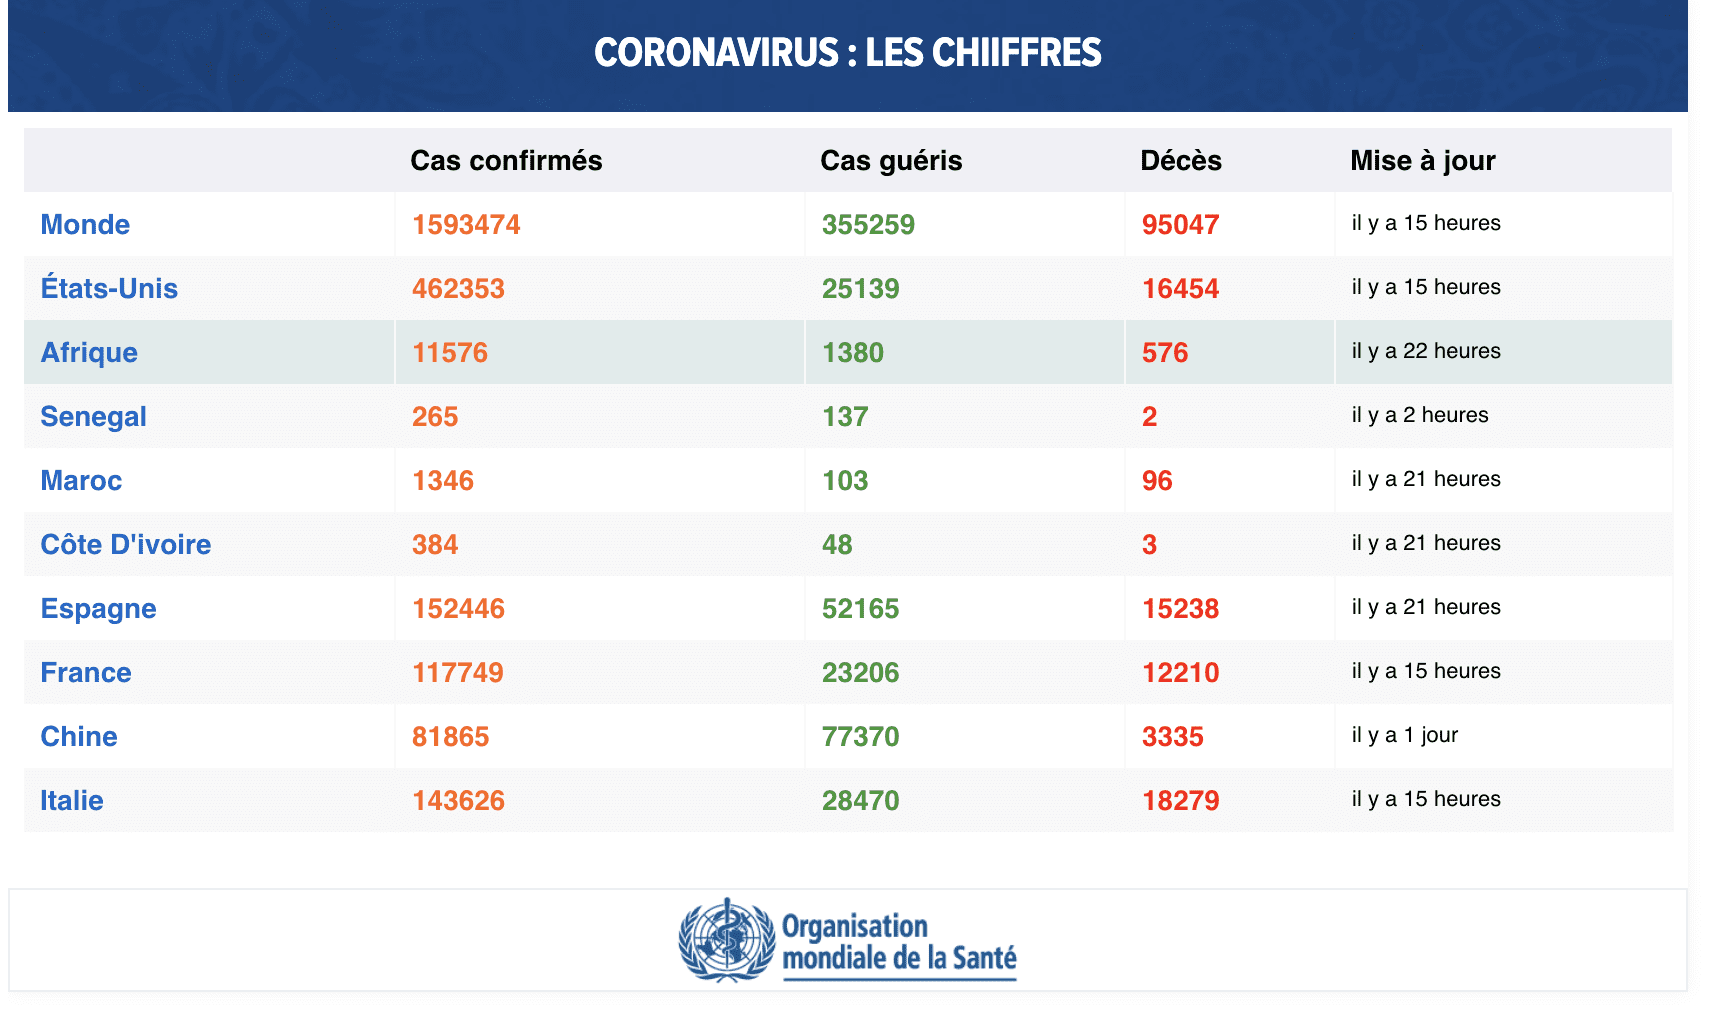 CORONAVIRUS : LES CHIIFFRES 10 AVRIL 2020